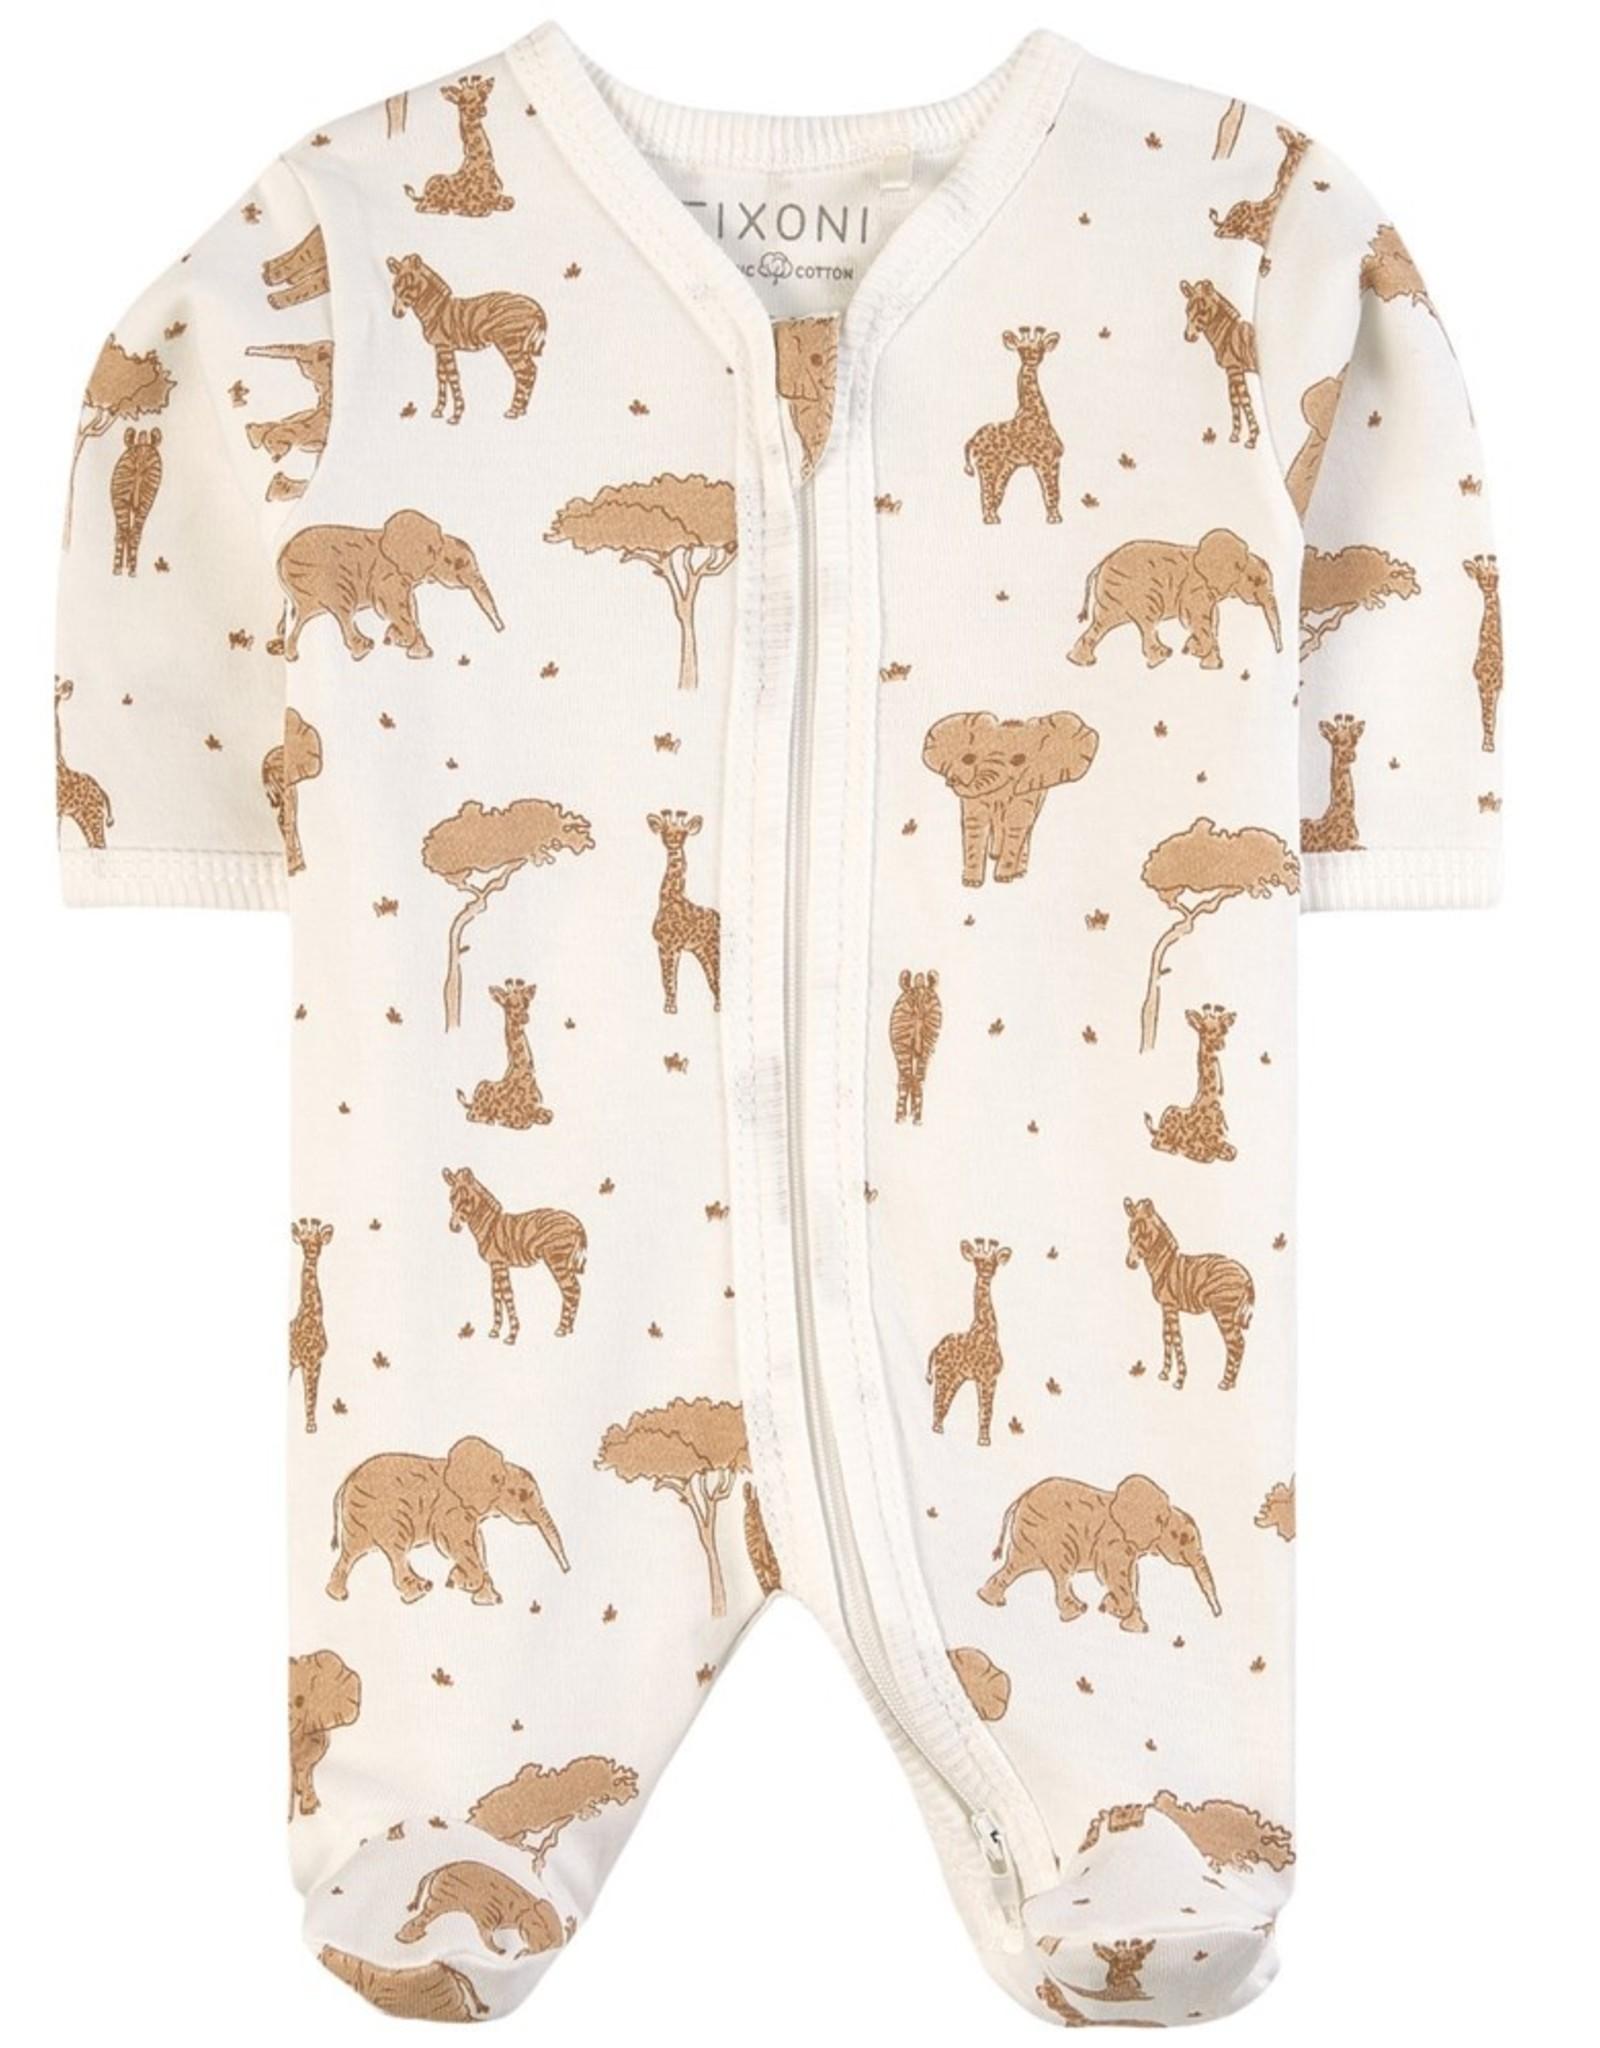 Fixoni Fixoni SP21 Sleeper w/ feet - Elephant